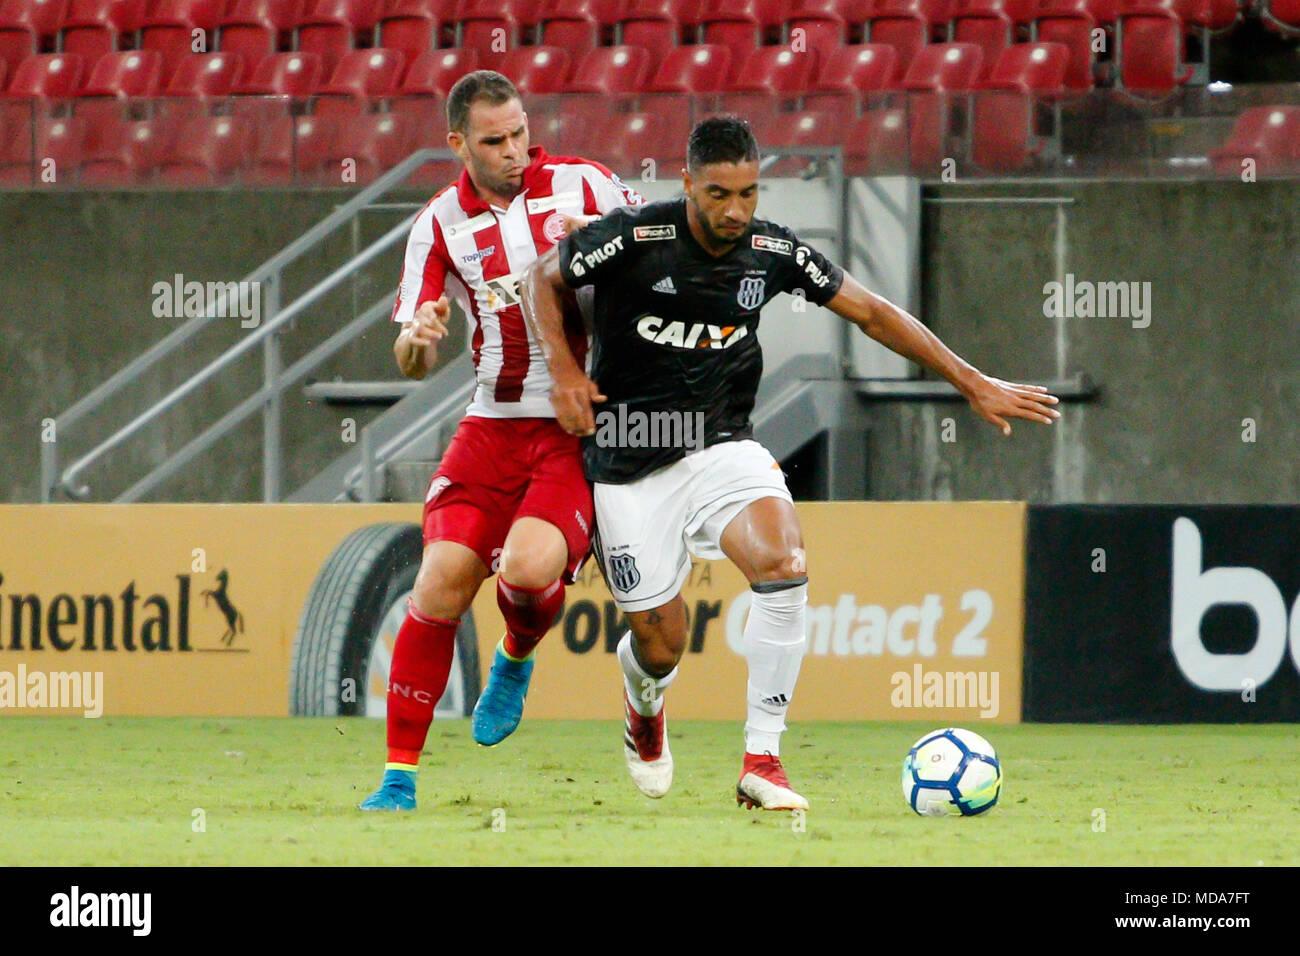 Sao Lourenco Da Mata Pe 18 04 2018 Nautico X Ponte Preta Wallace Pernambucano Player Of The